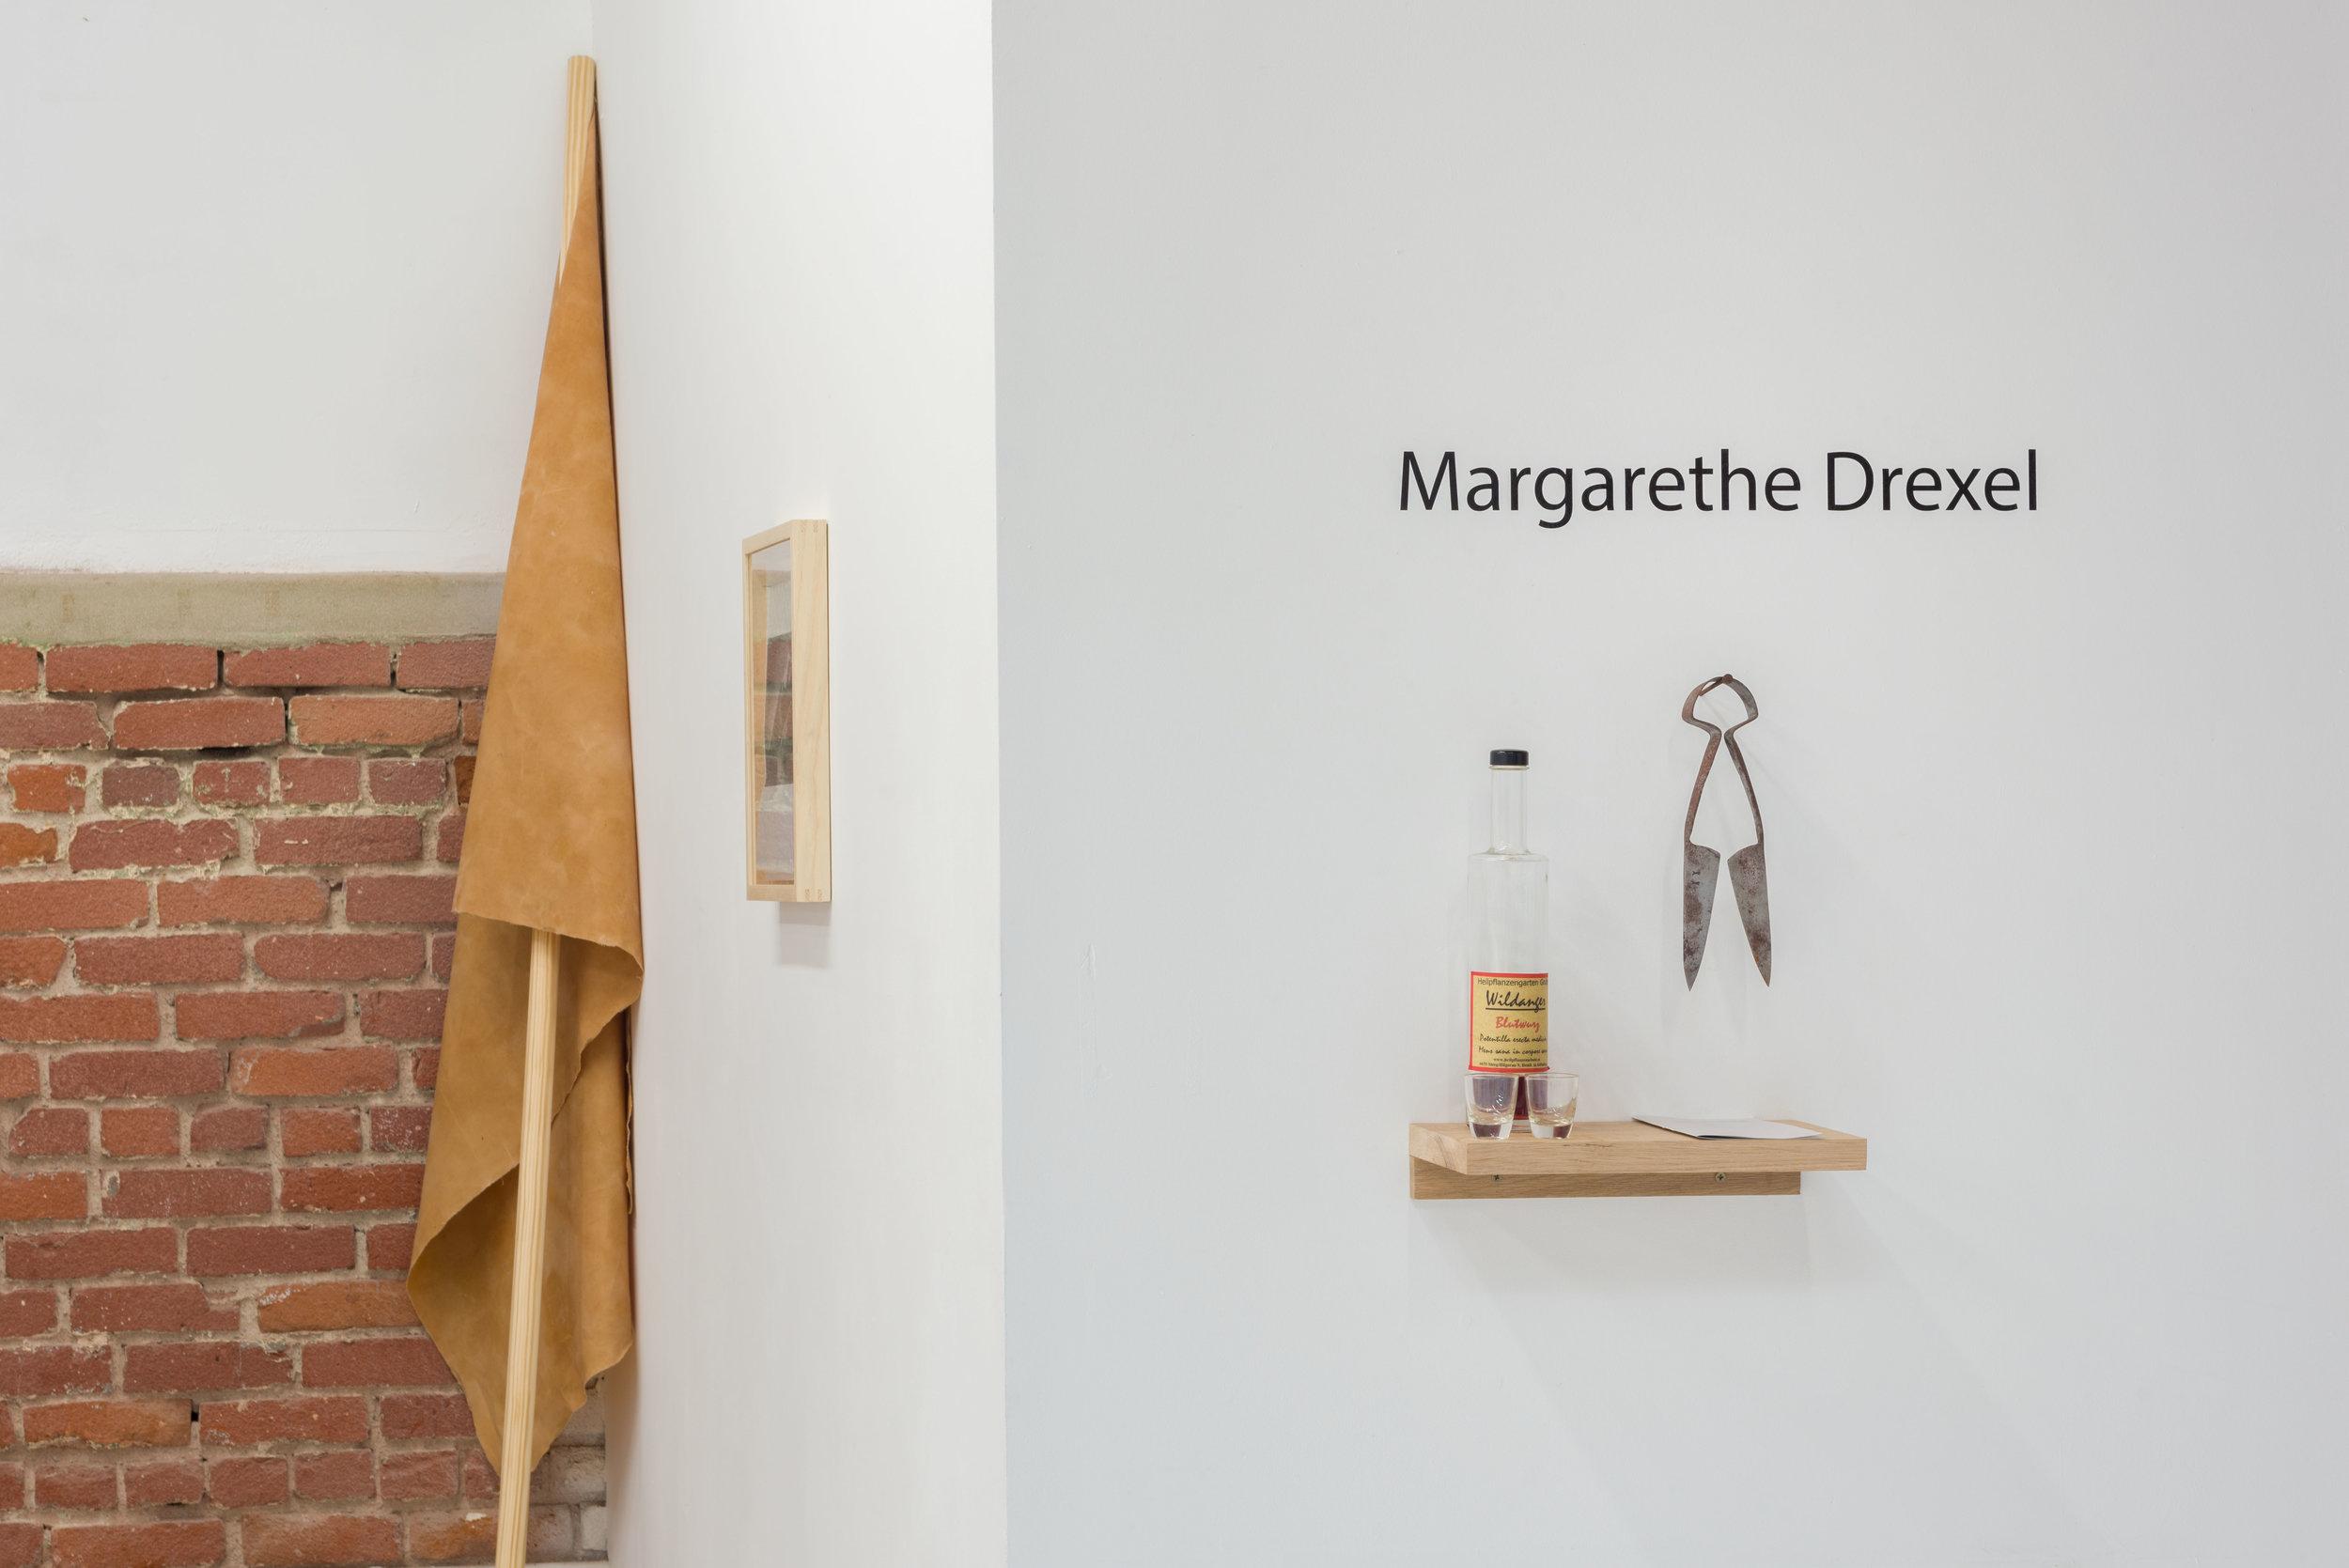 MARGARETHE DREXEL - 'Potentilla erecta. Mens sana in corpore sano.'